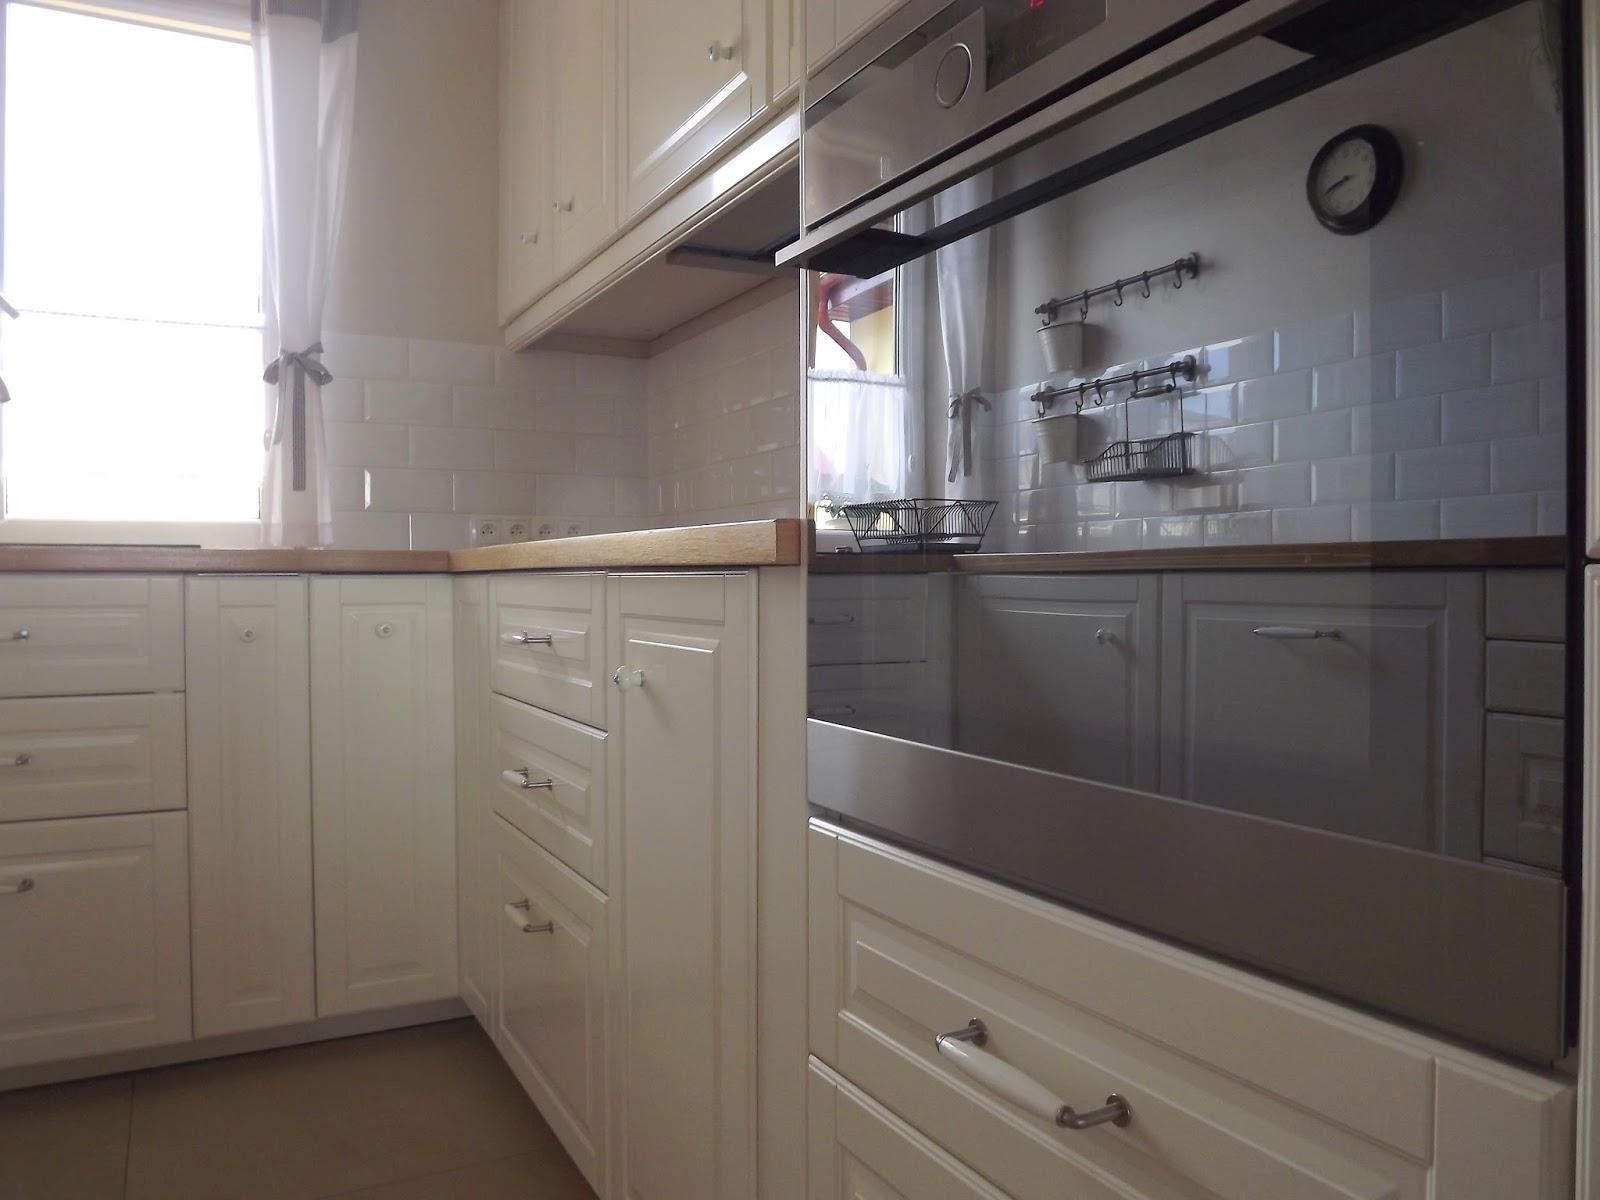 Homemaking Is Hot Kuchnia Z Ikea Na Wymiar